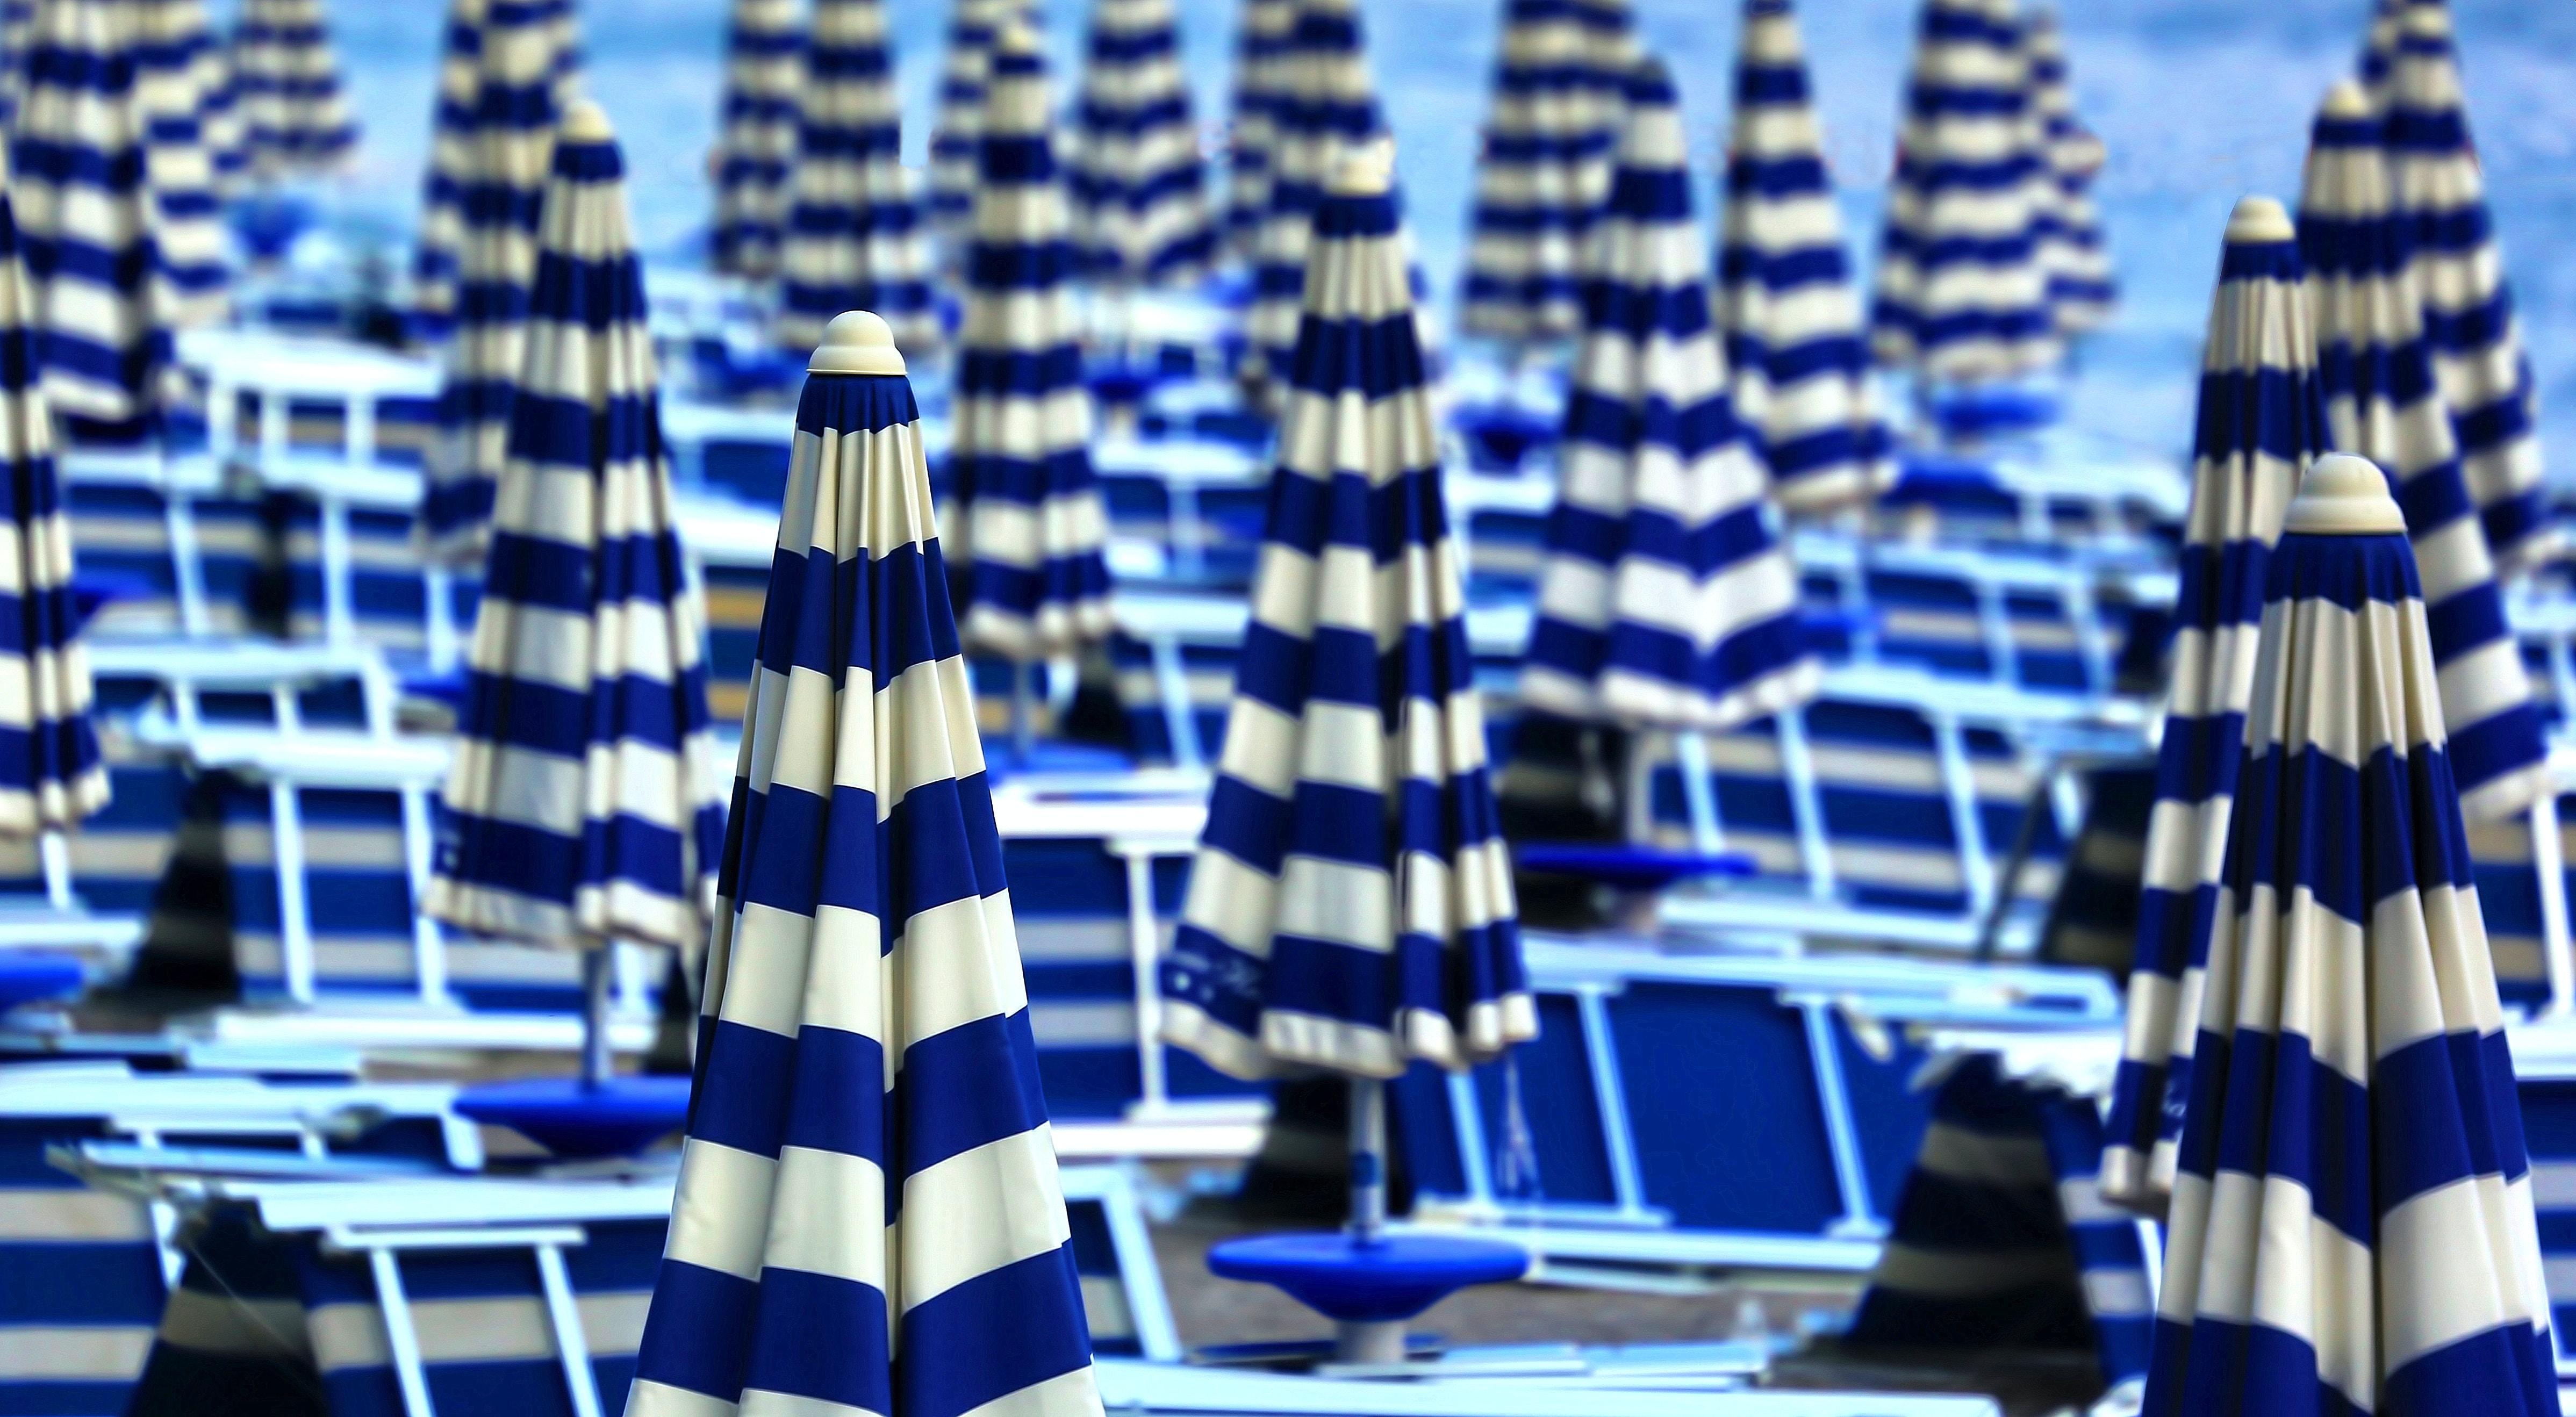 A beach with blue and white picnic tables and umbrellas in Sapore di' Mare